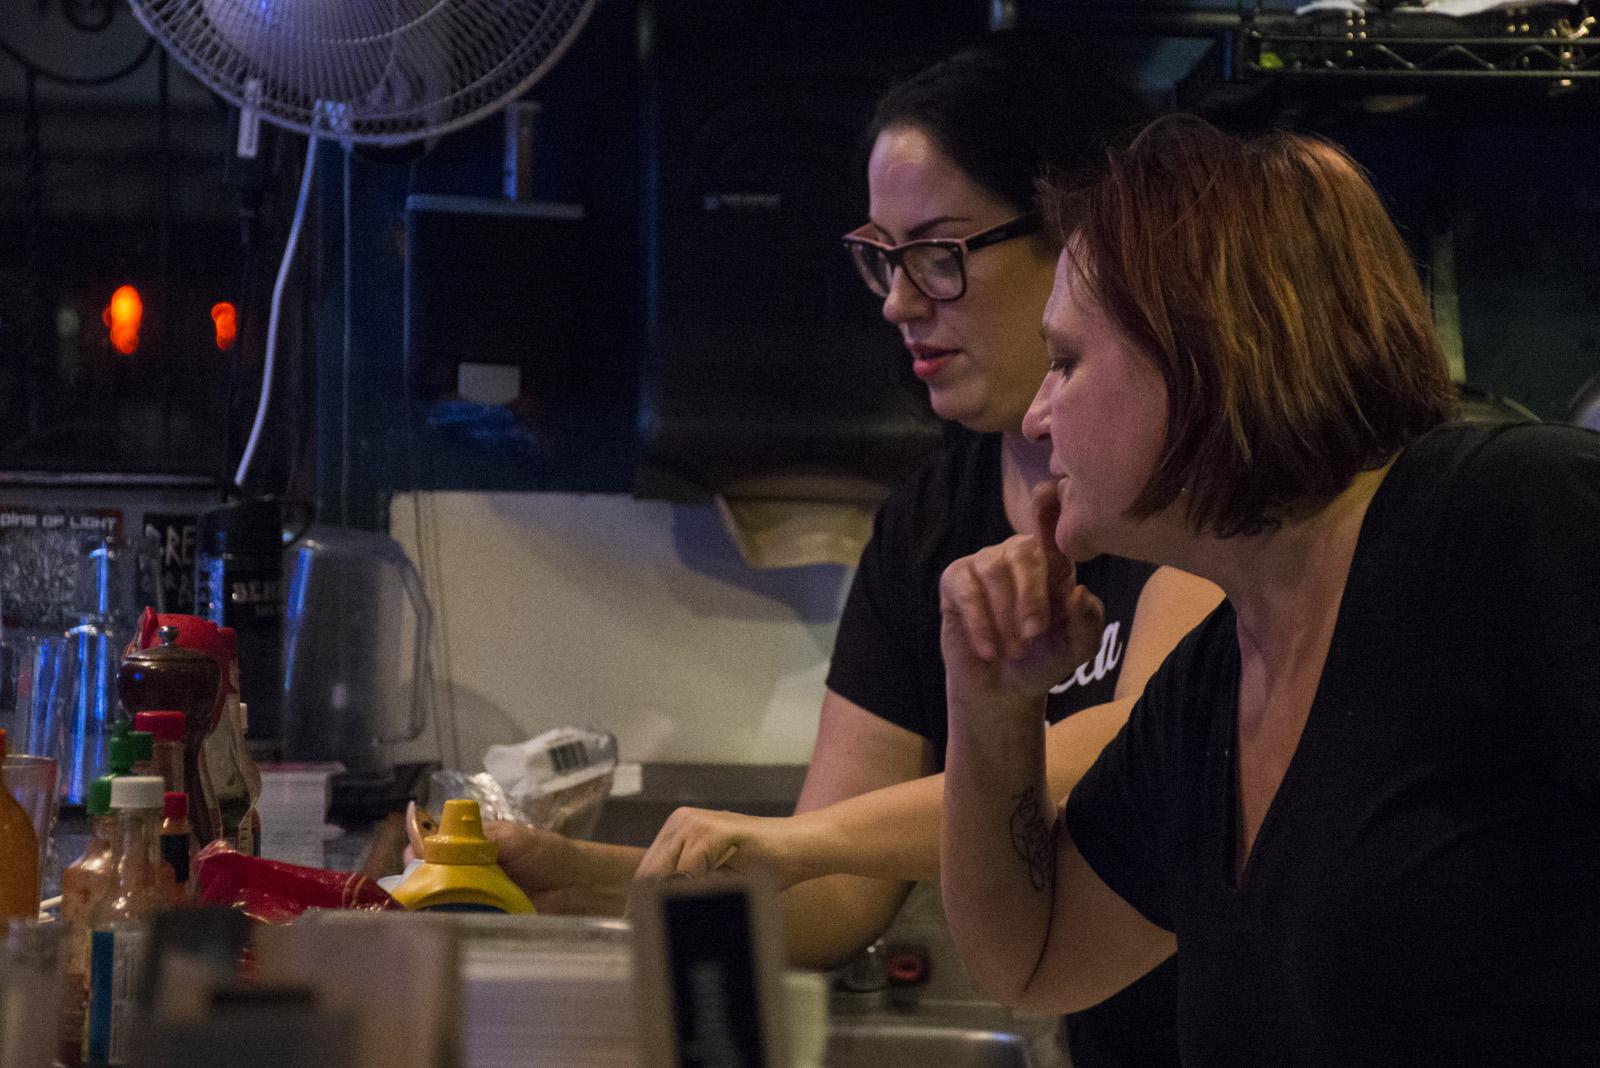 Making food at La Cubana and Elote. Photo by Lola M. Chavez